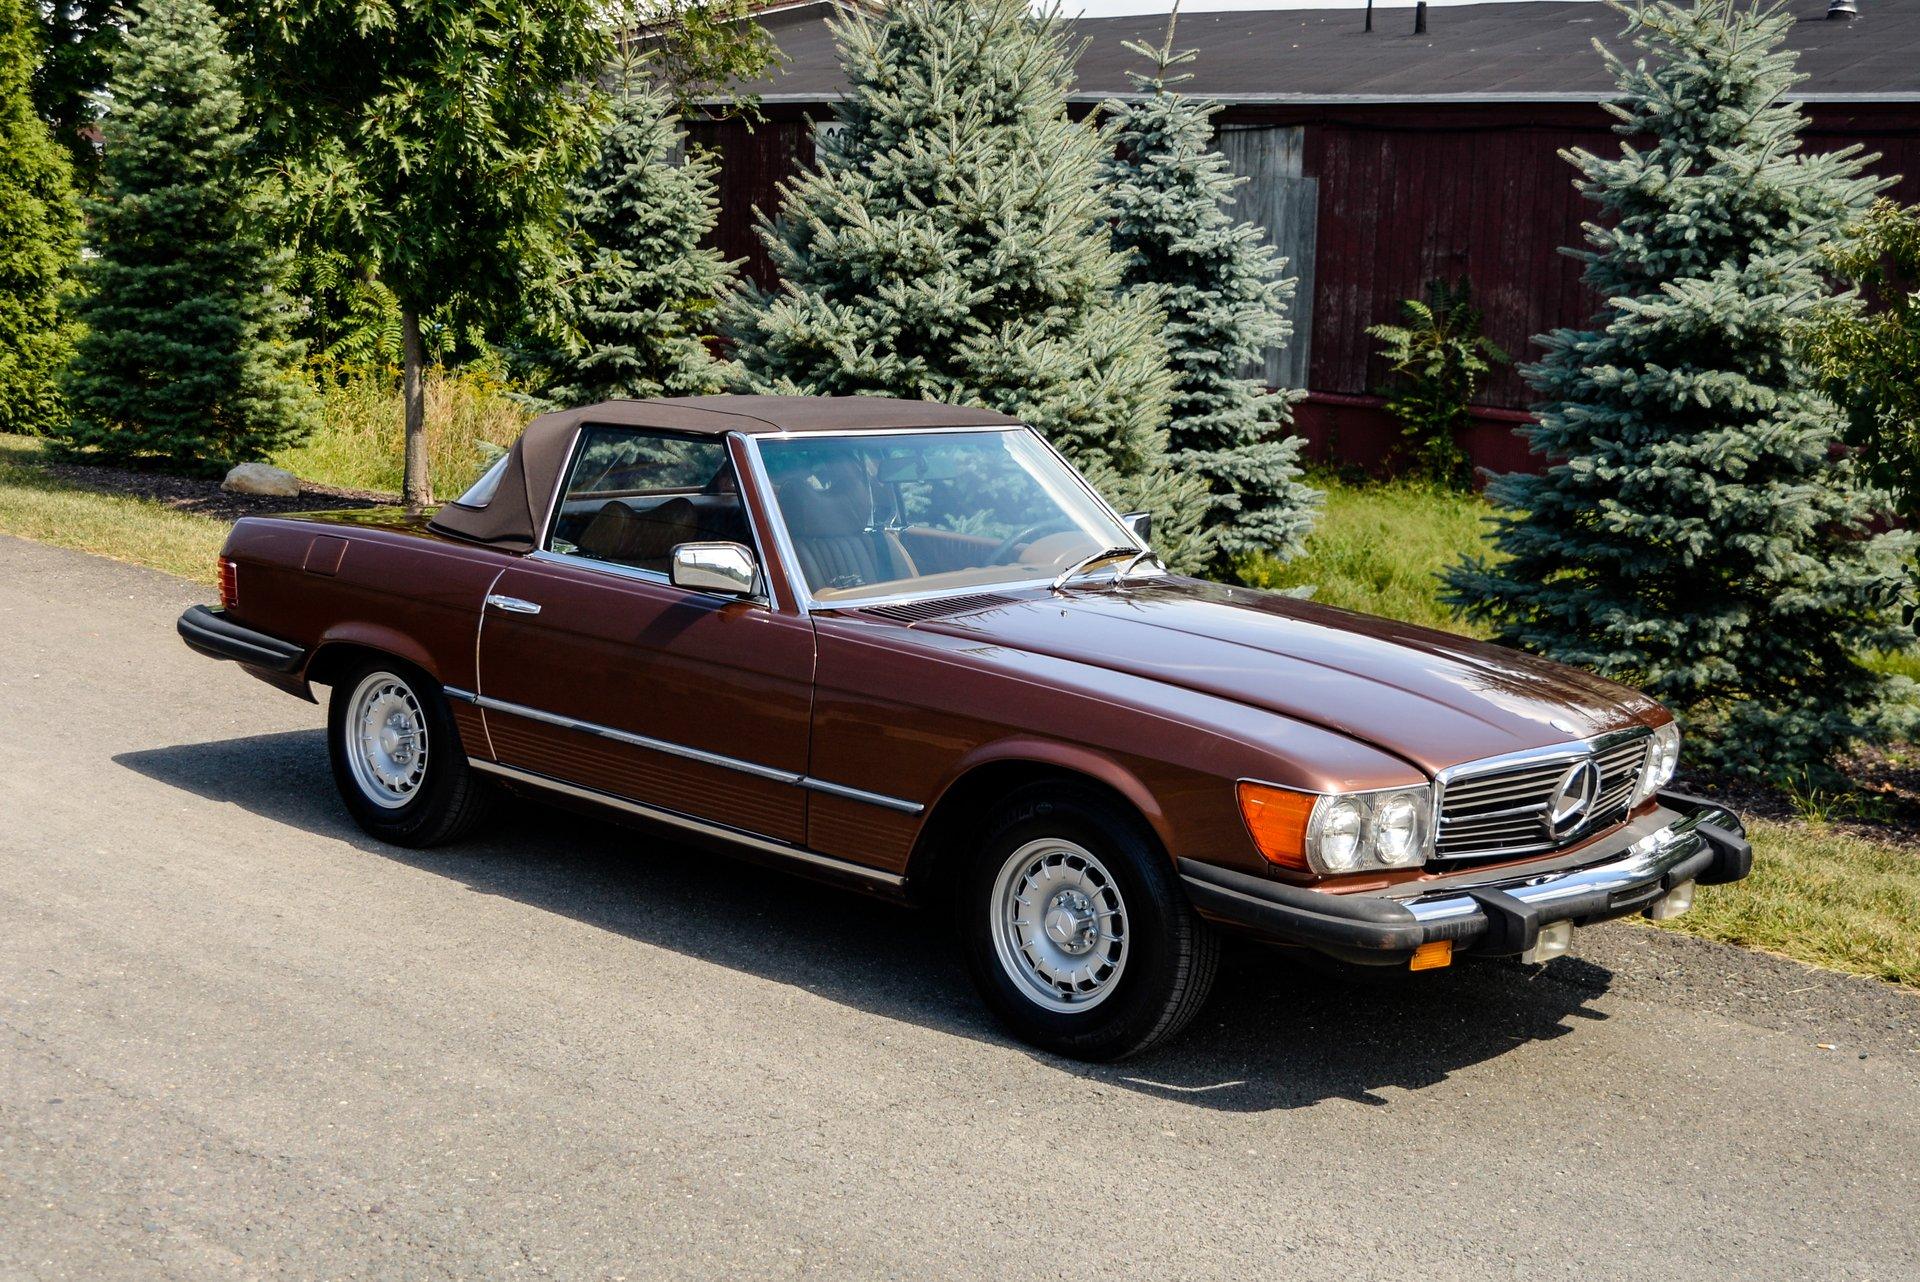 1978 Mercedes-Benz 450SL | Saratoga Auto Auction